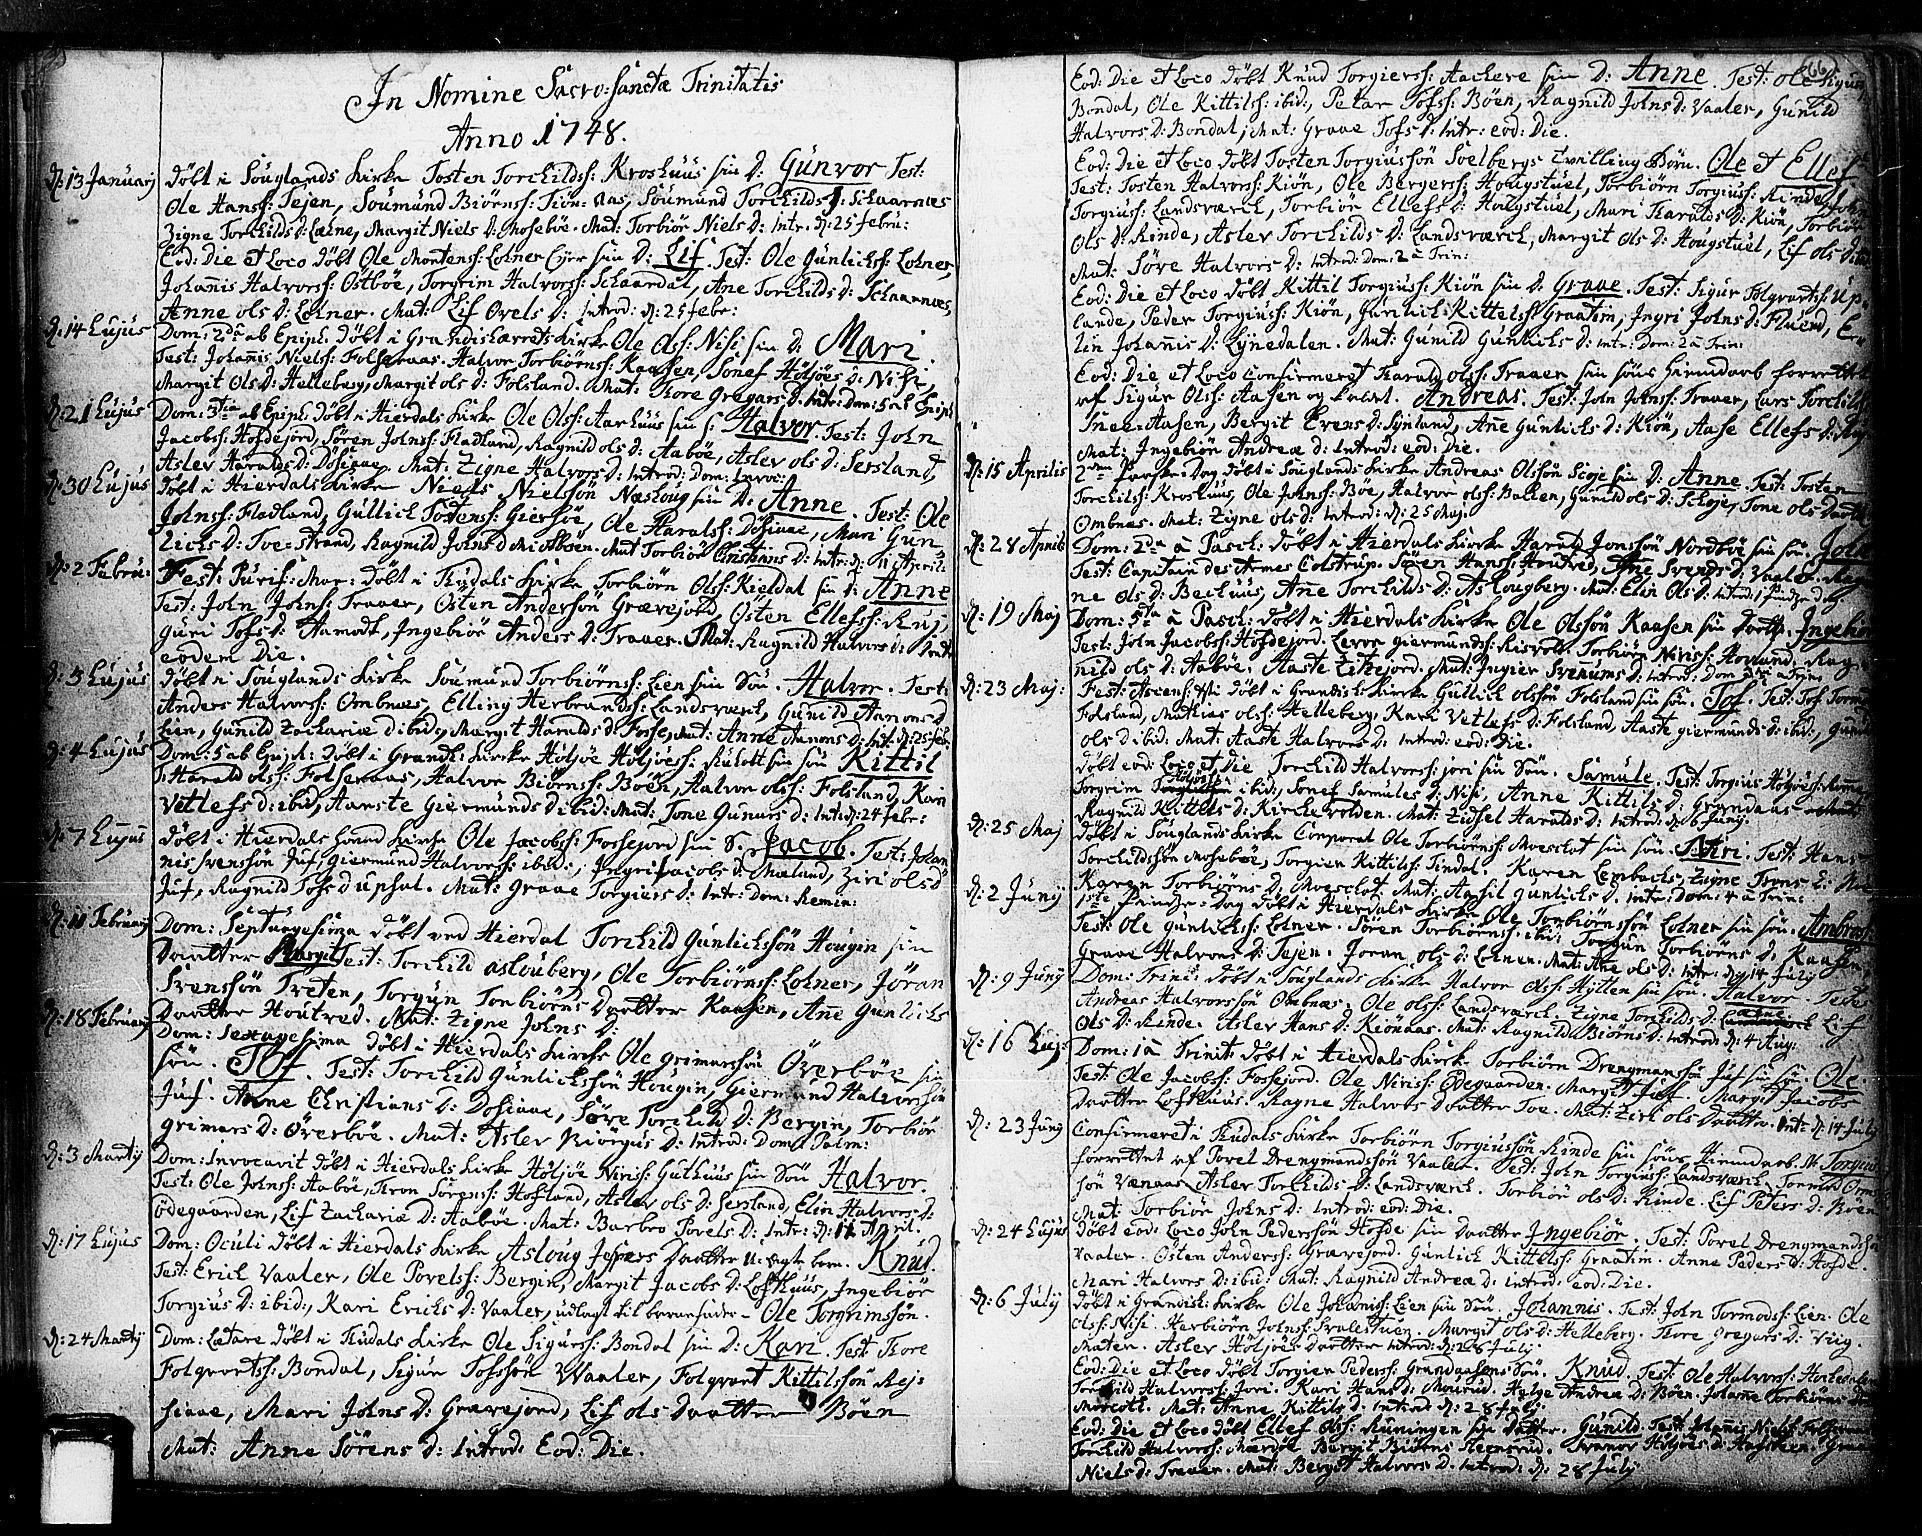 SAKO, Hjartdal kirkebøker, F/Fa/L0003: Ministerialbok nr. I 3, 1727-1775, s. 66